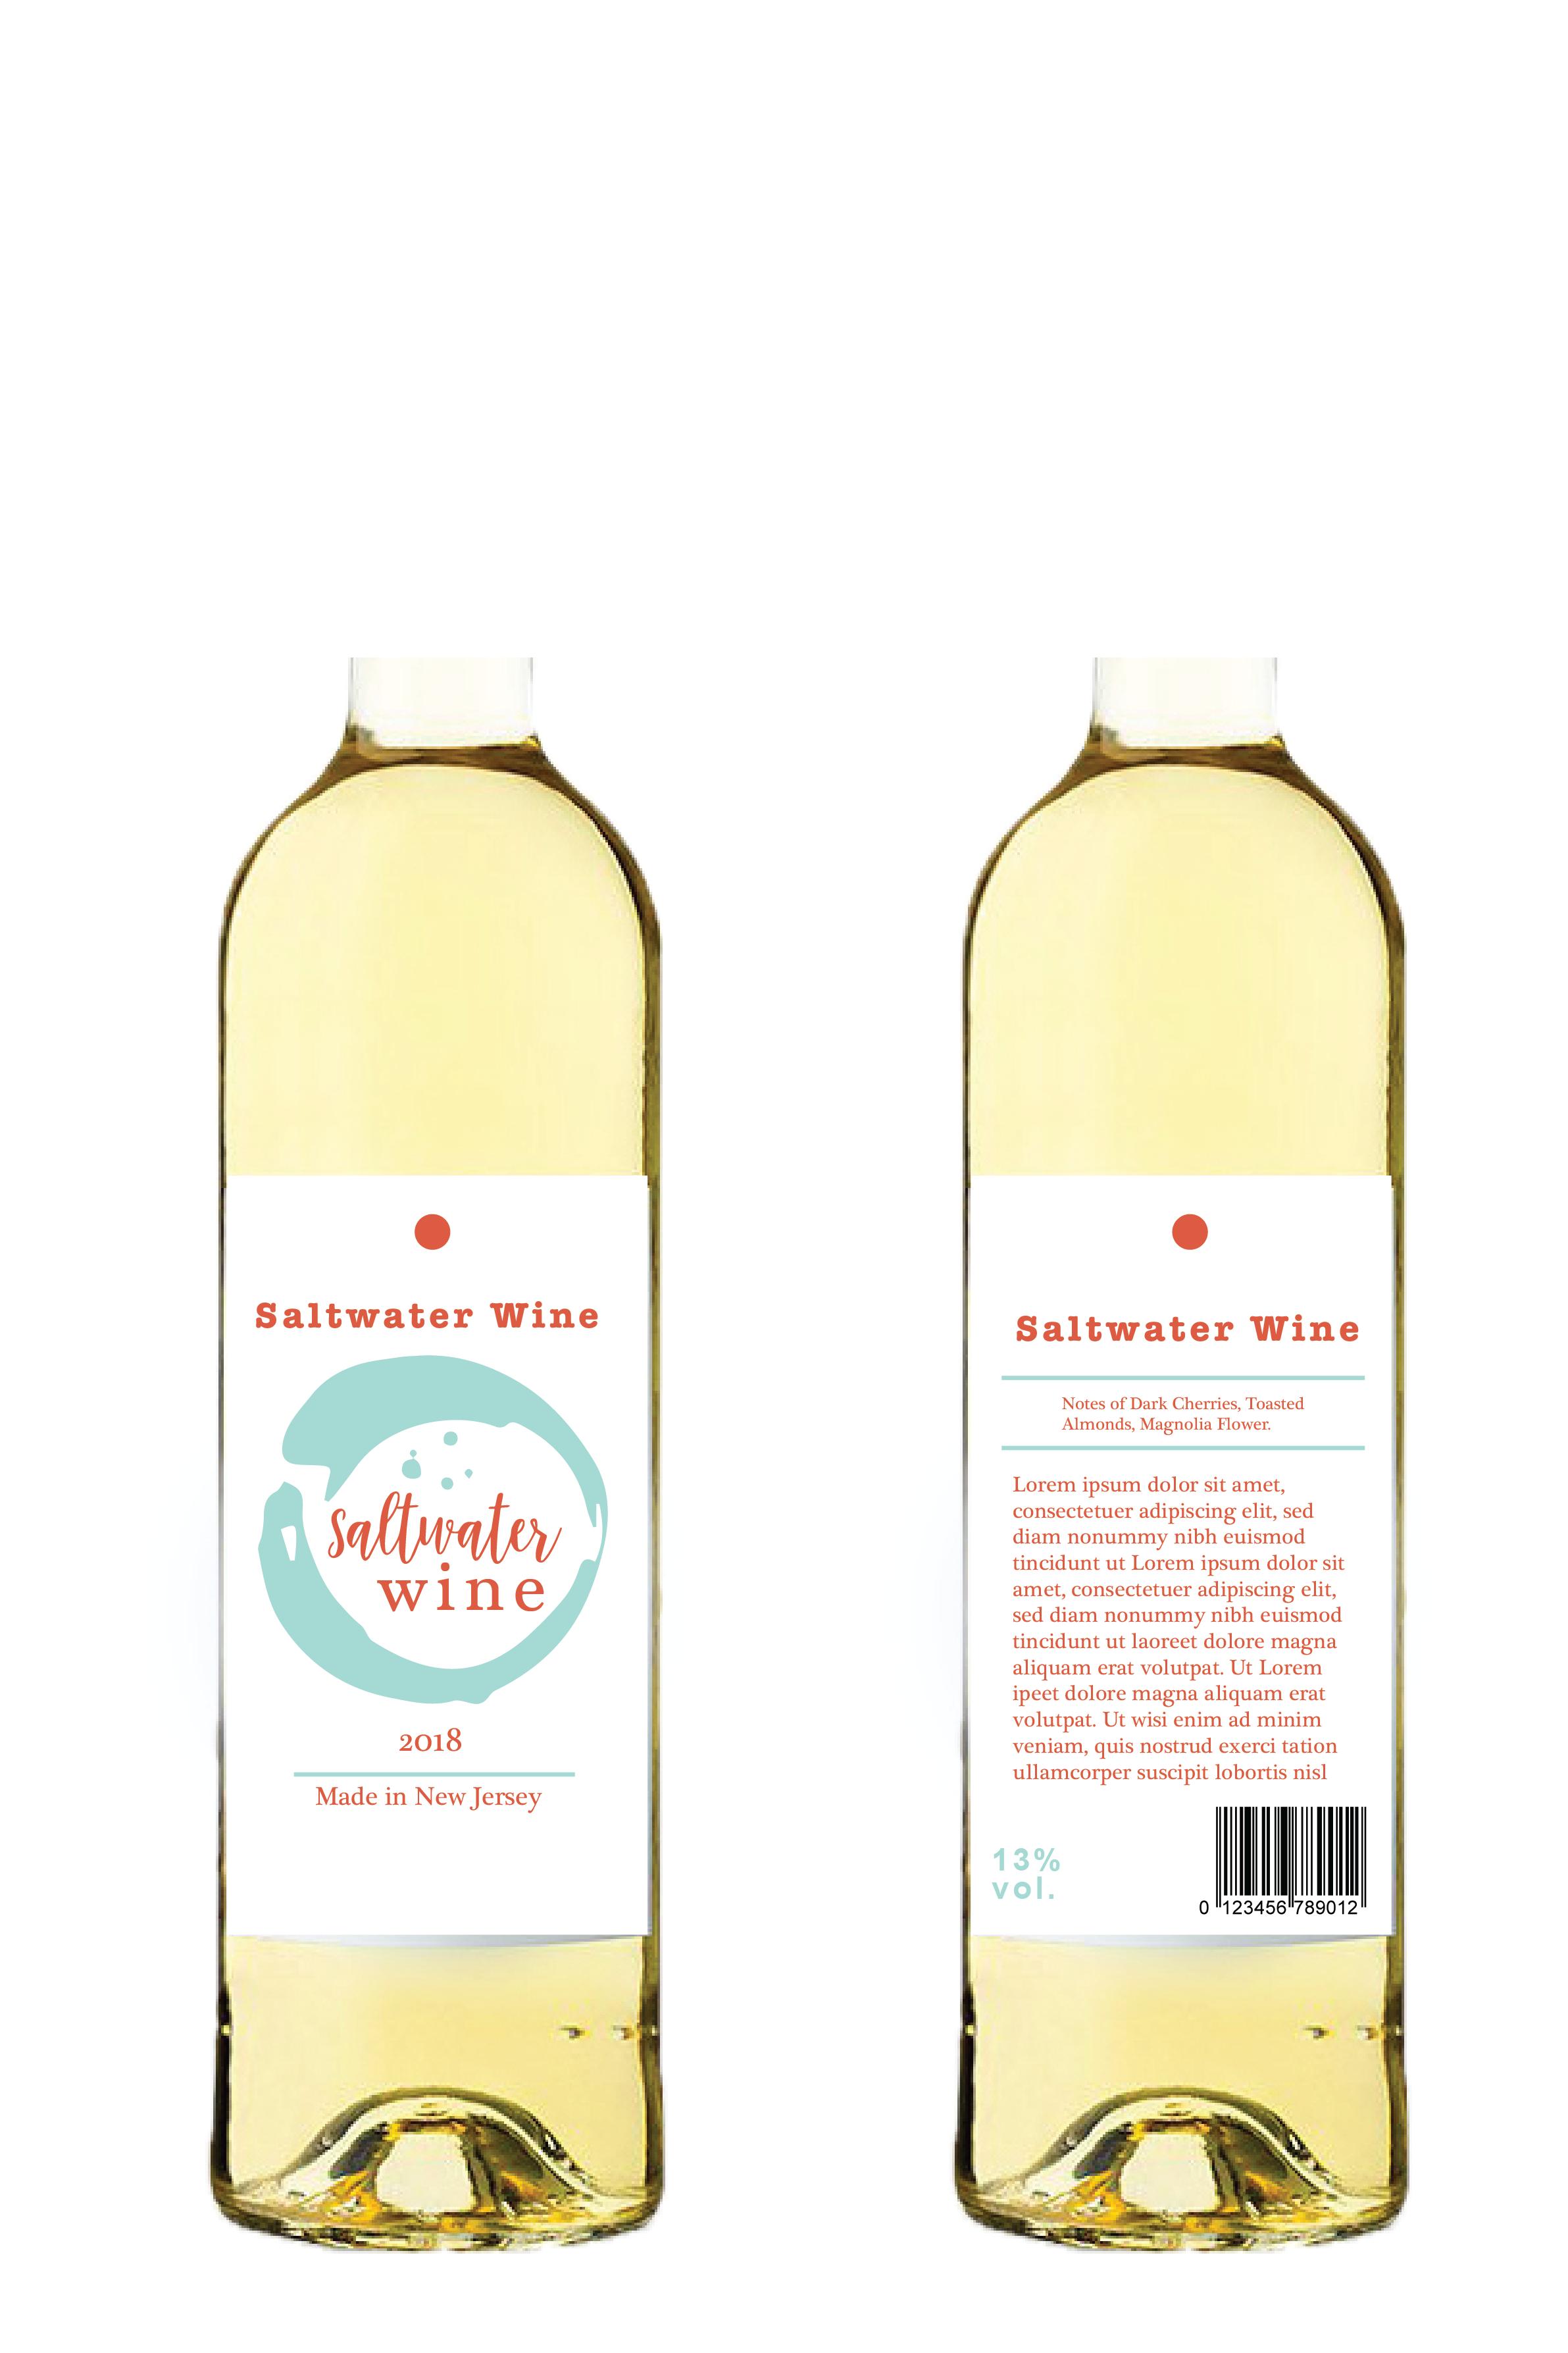 Saltwater Wines - Asbury Park, New Jersey